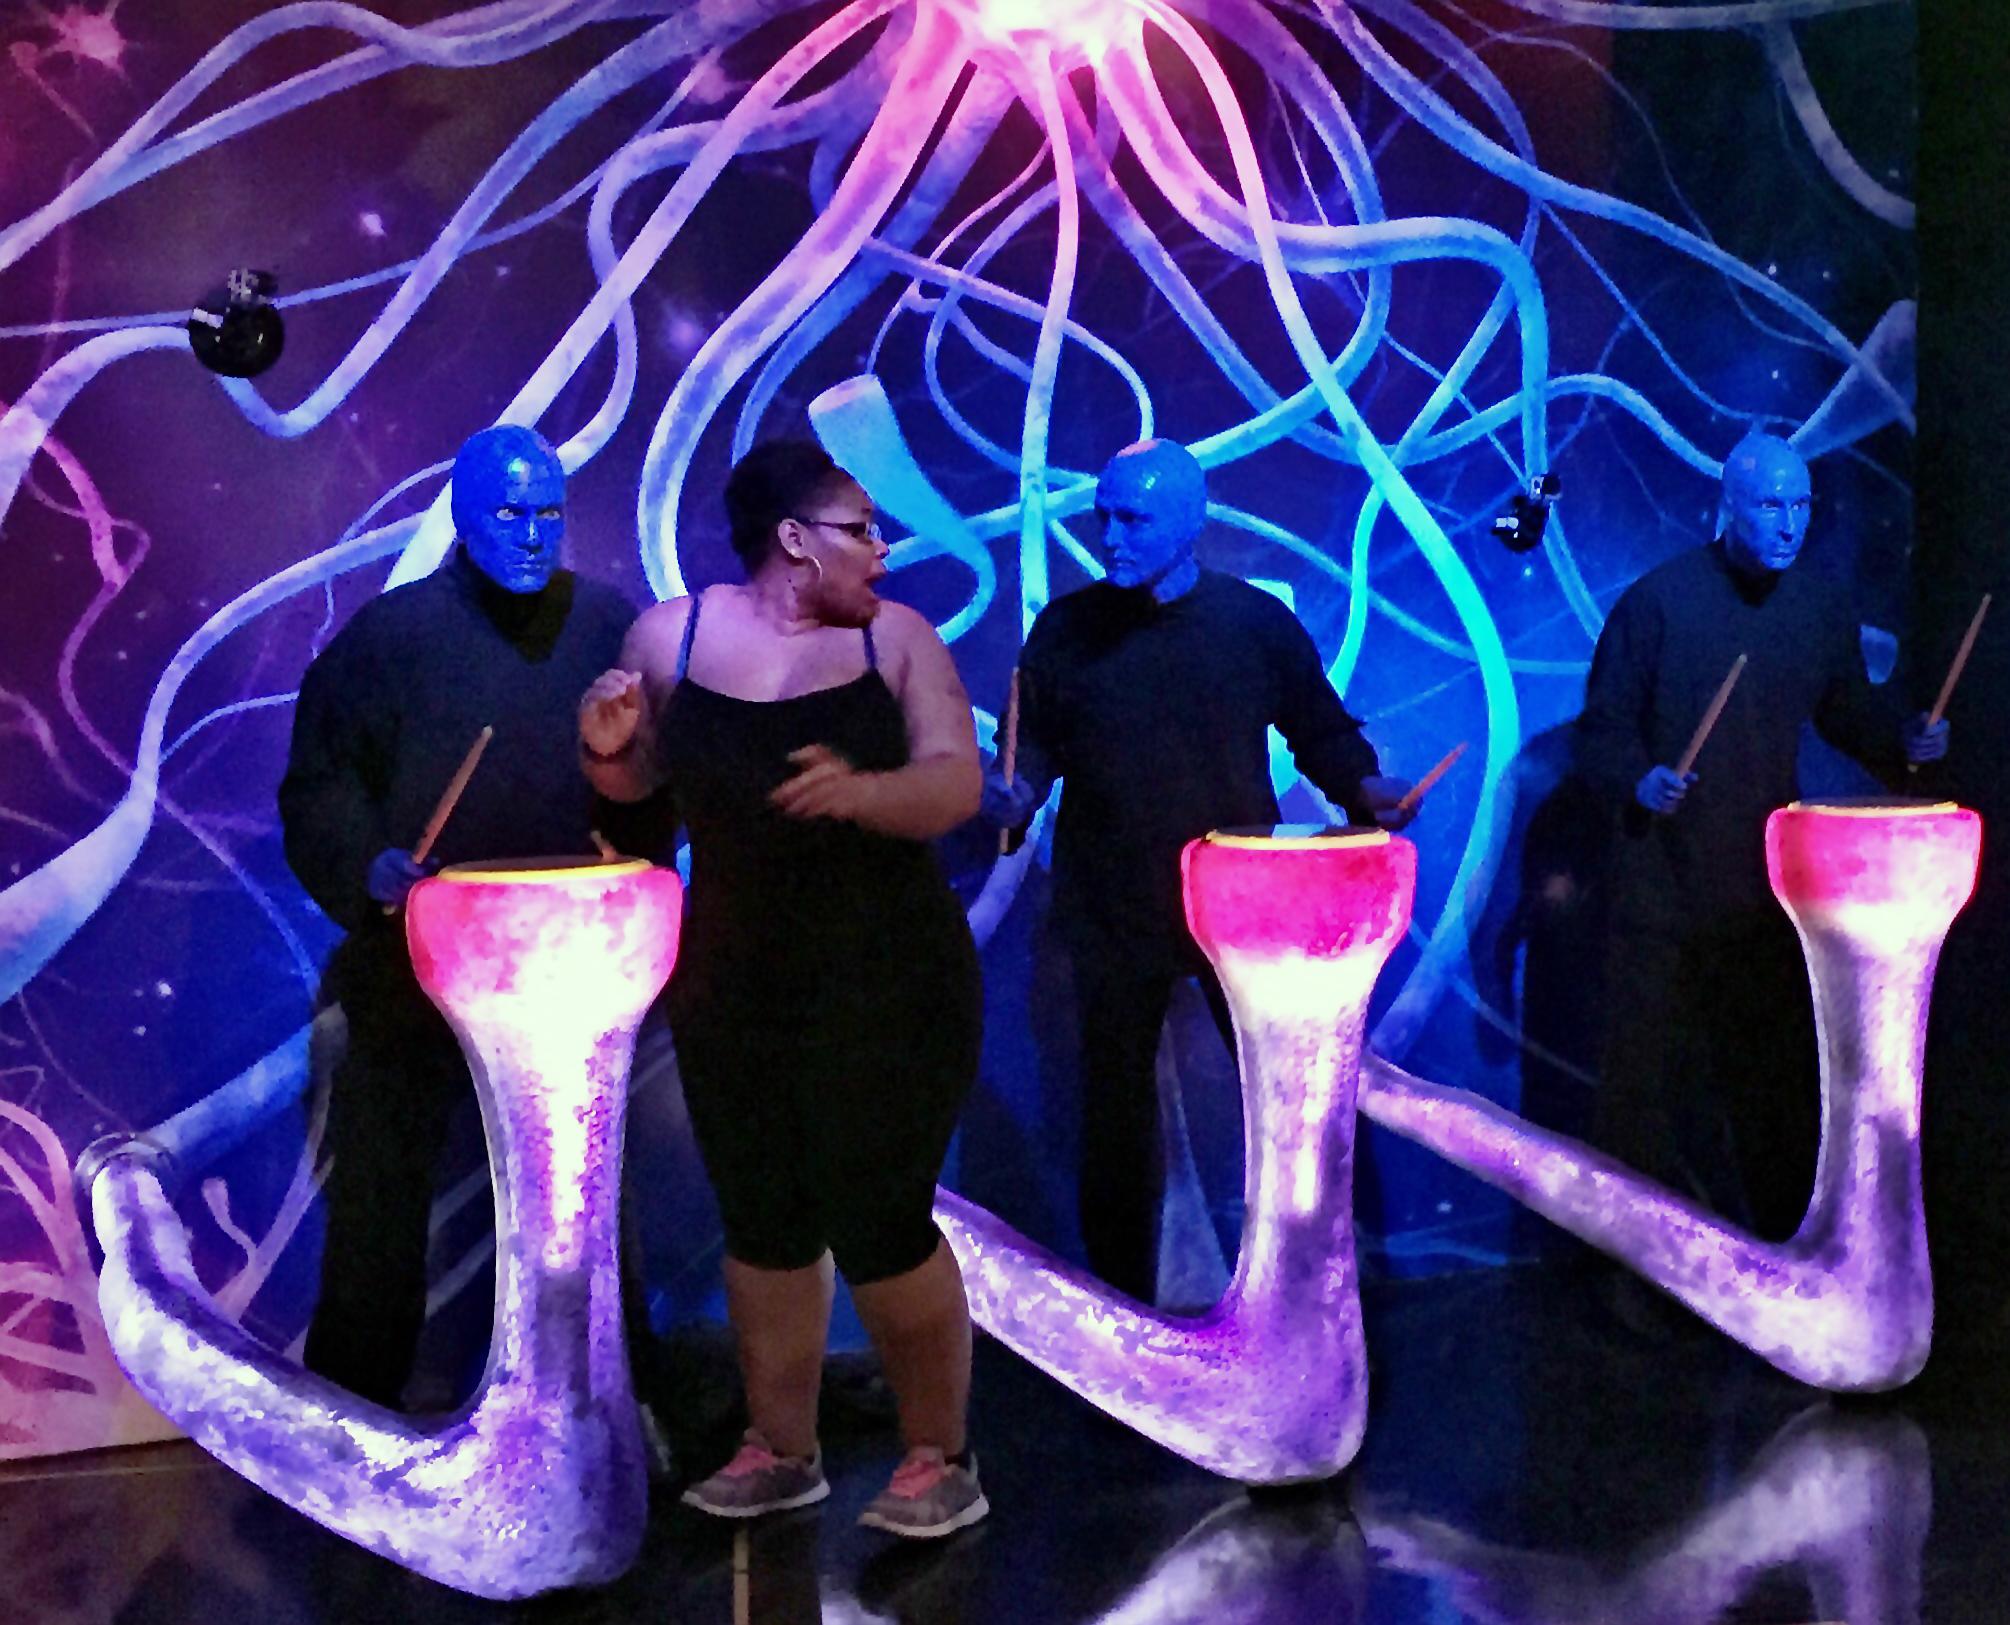 Blue Man Group Prank at Madame Tussauds